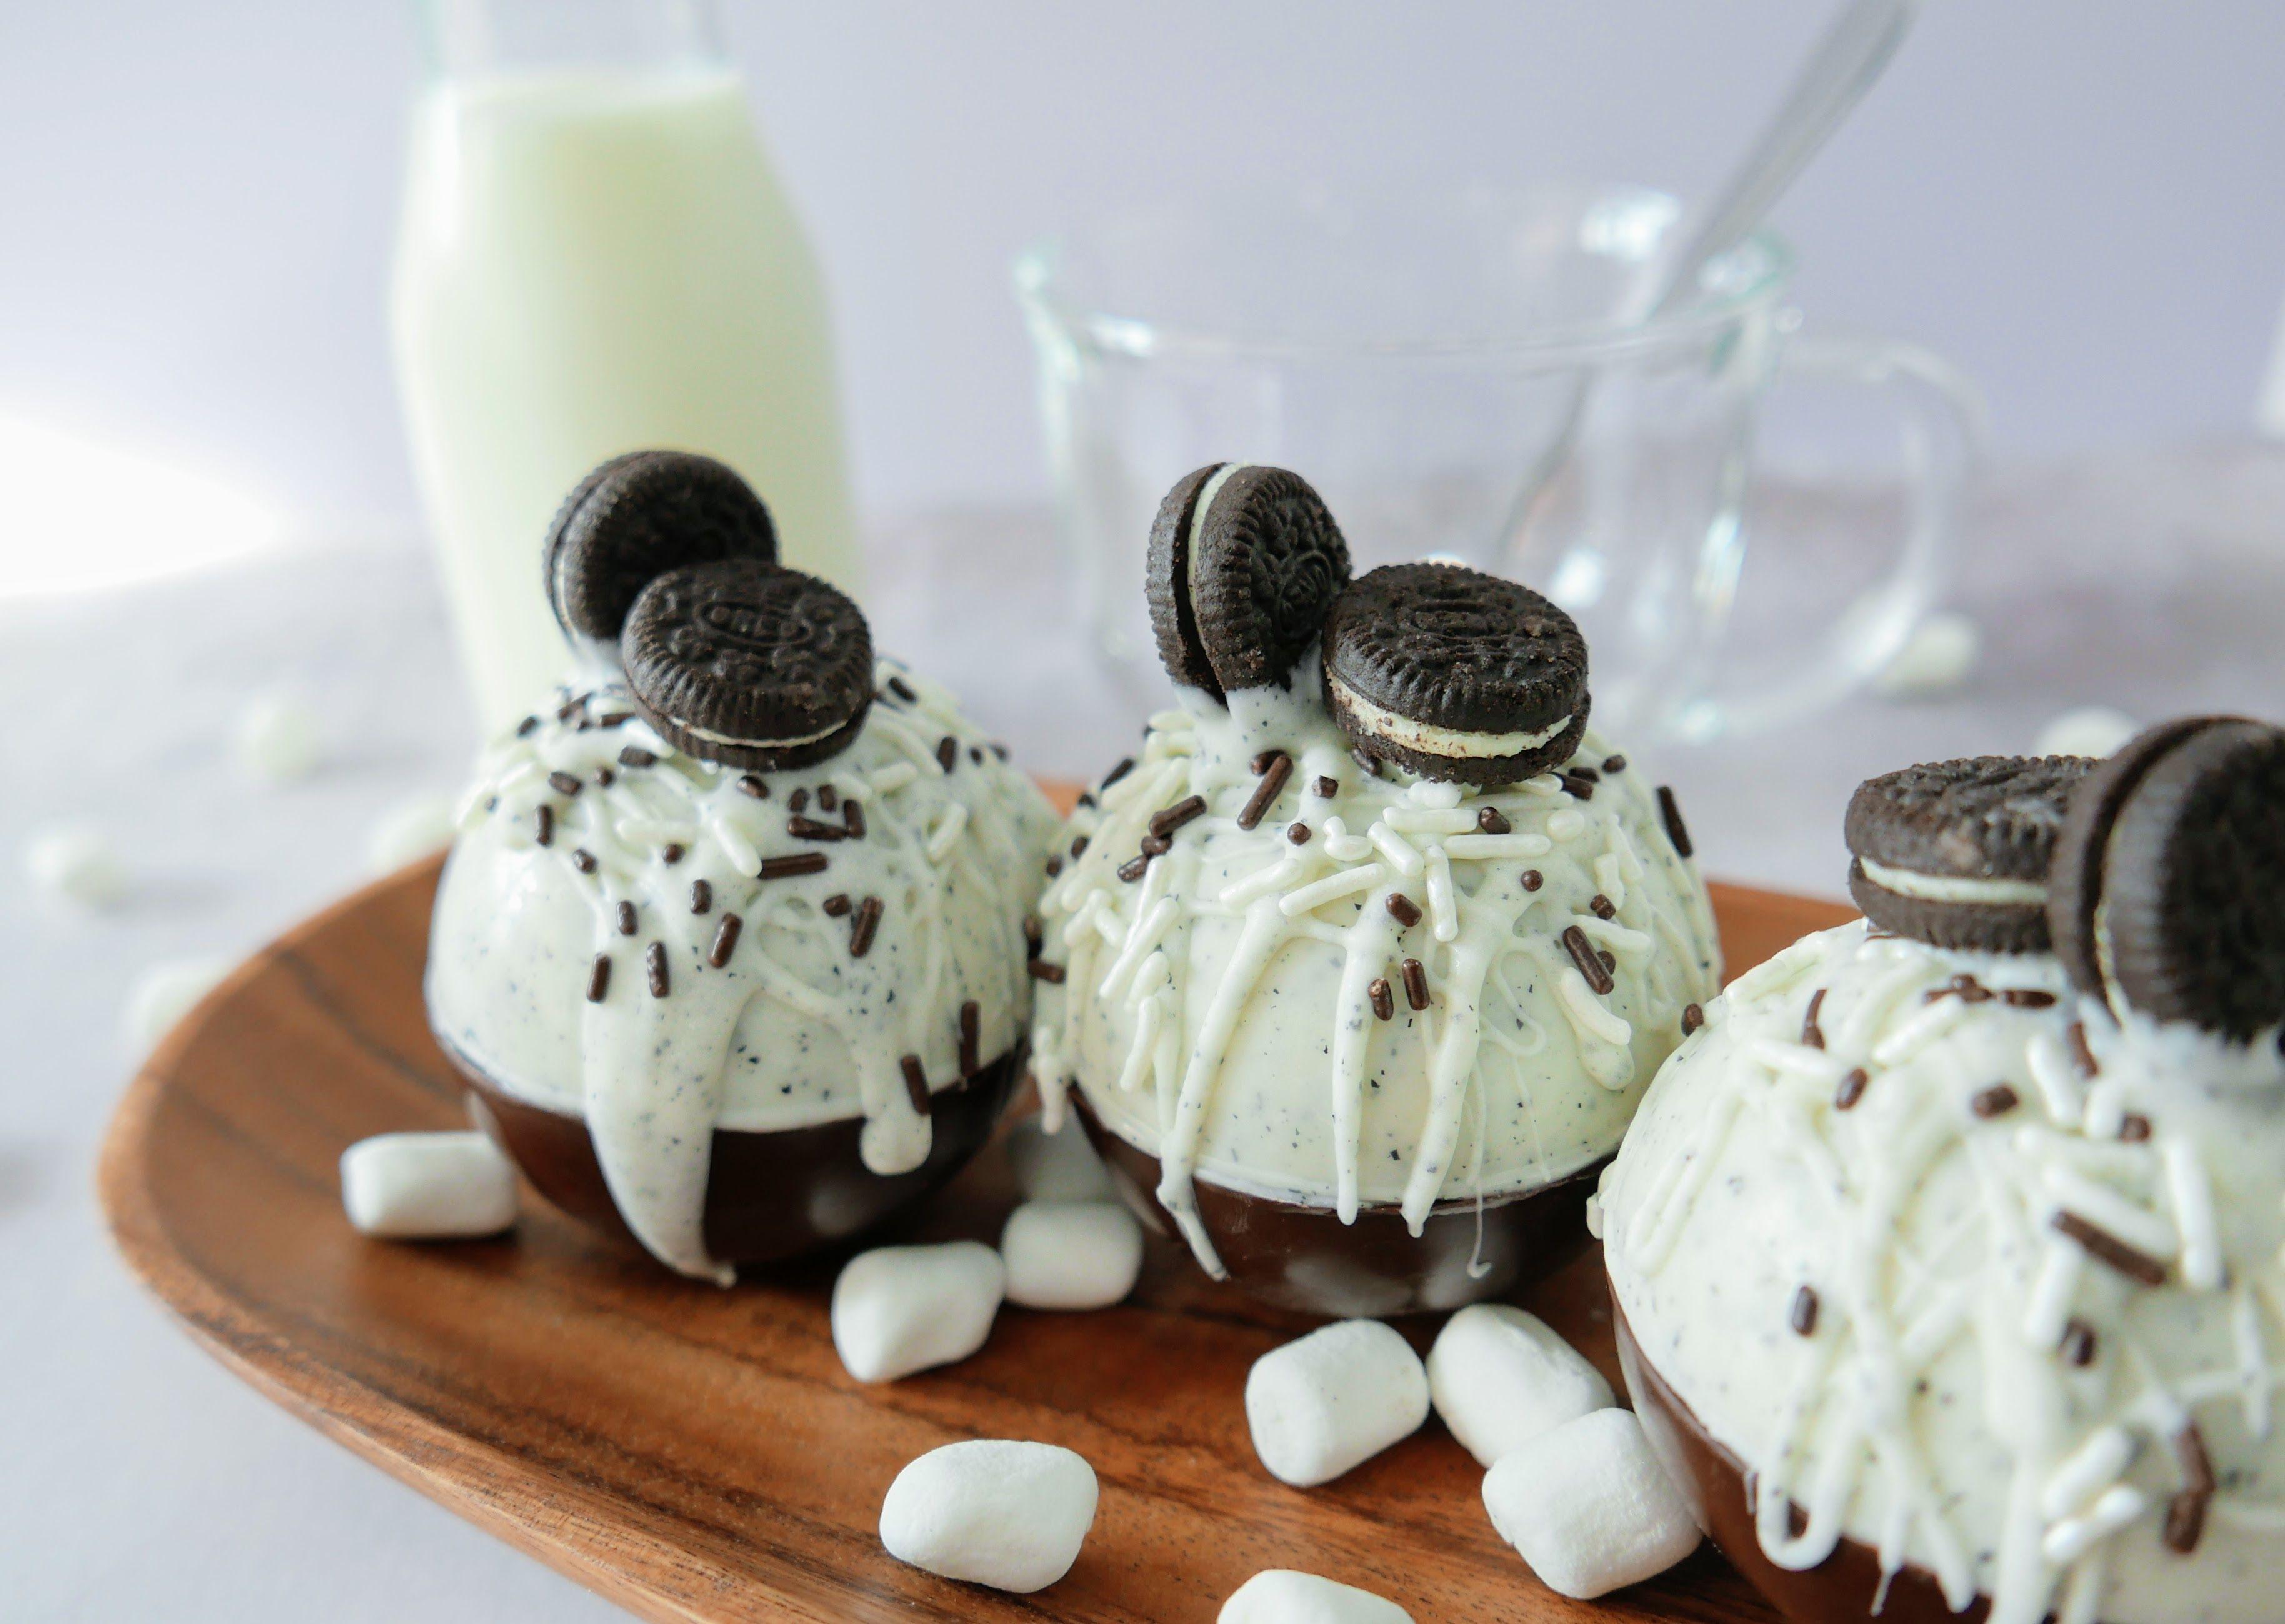 Oreo Hot Chocolate Bombs